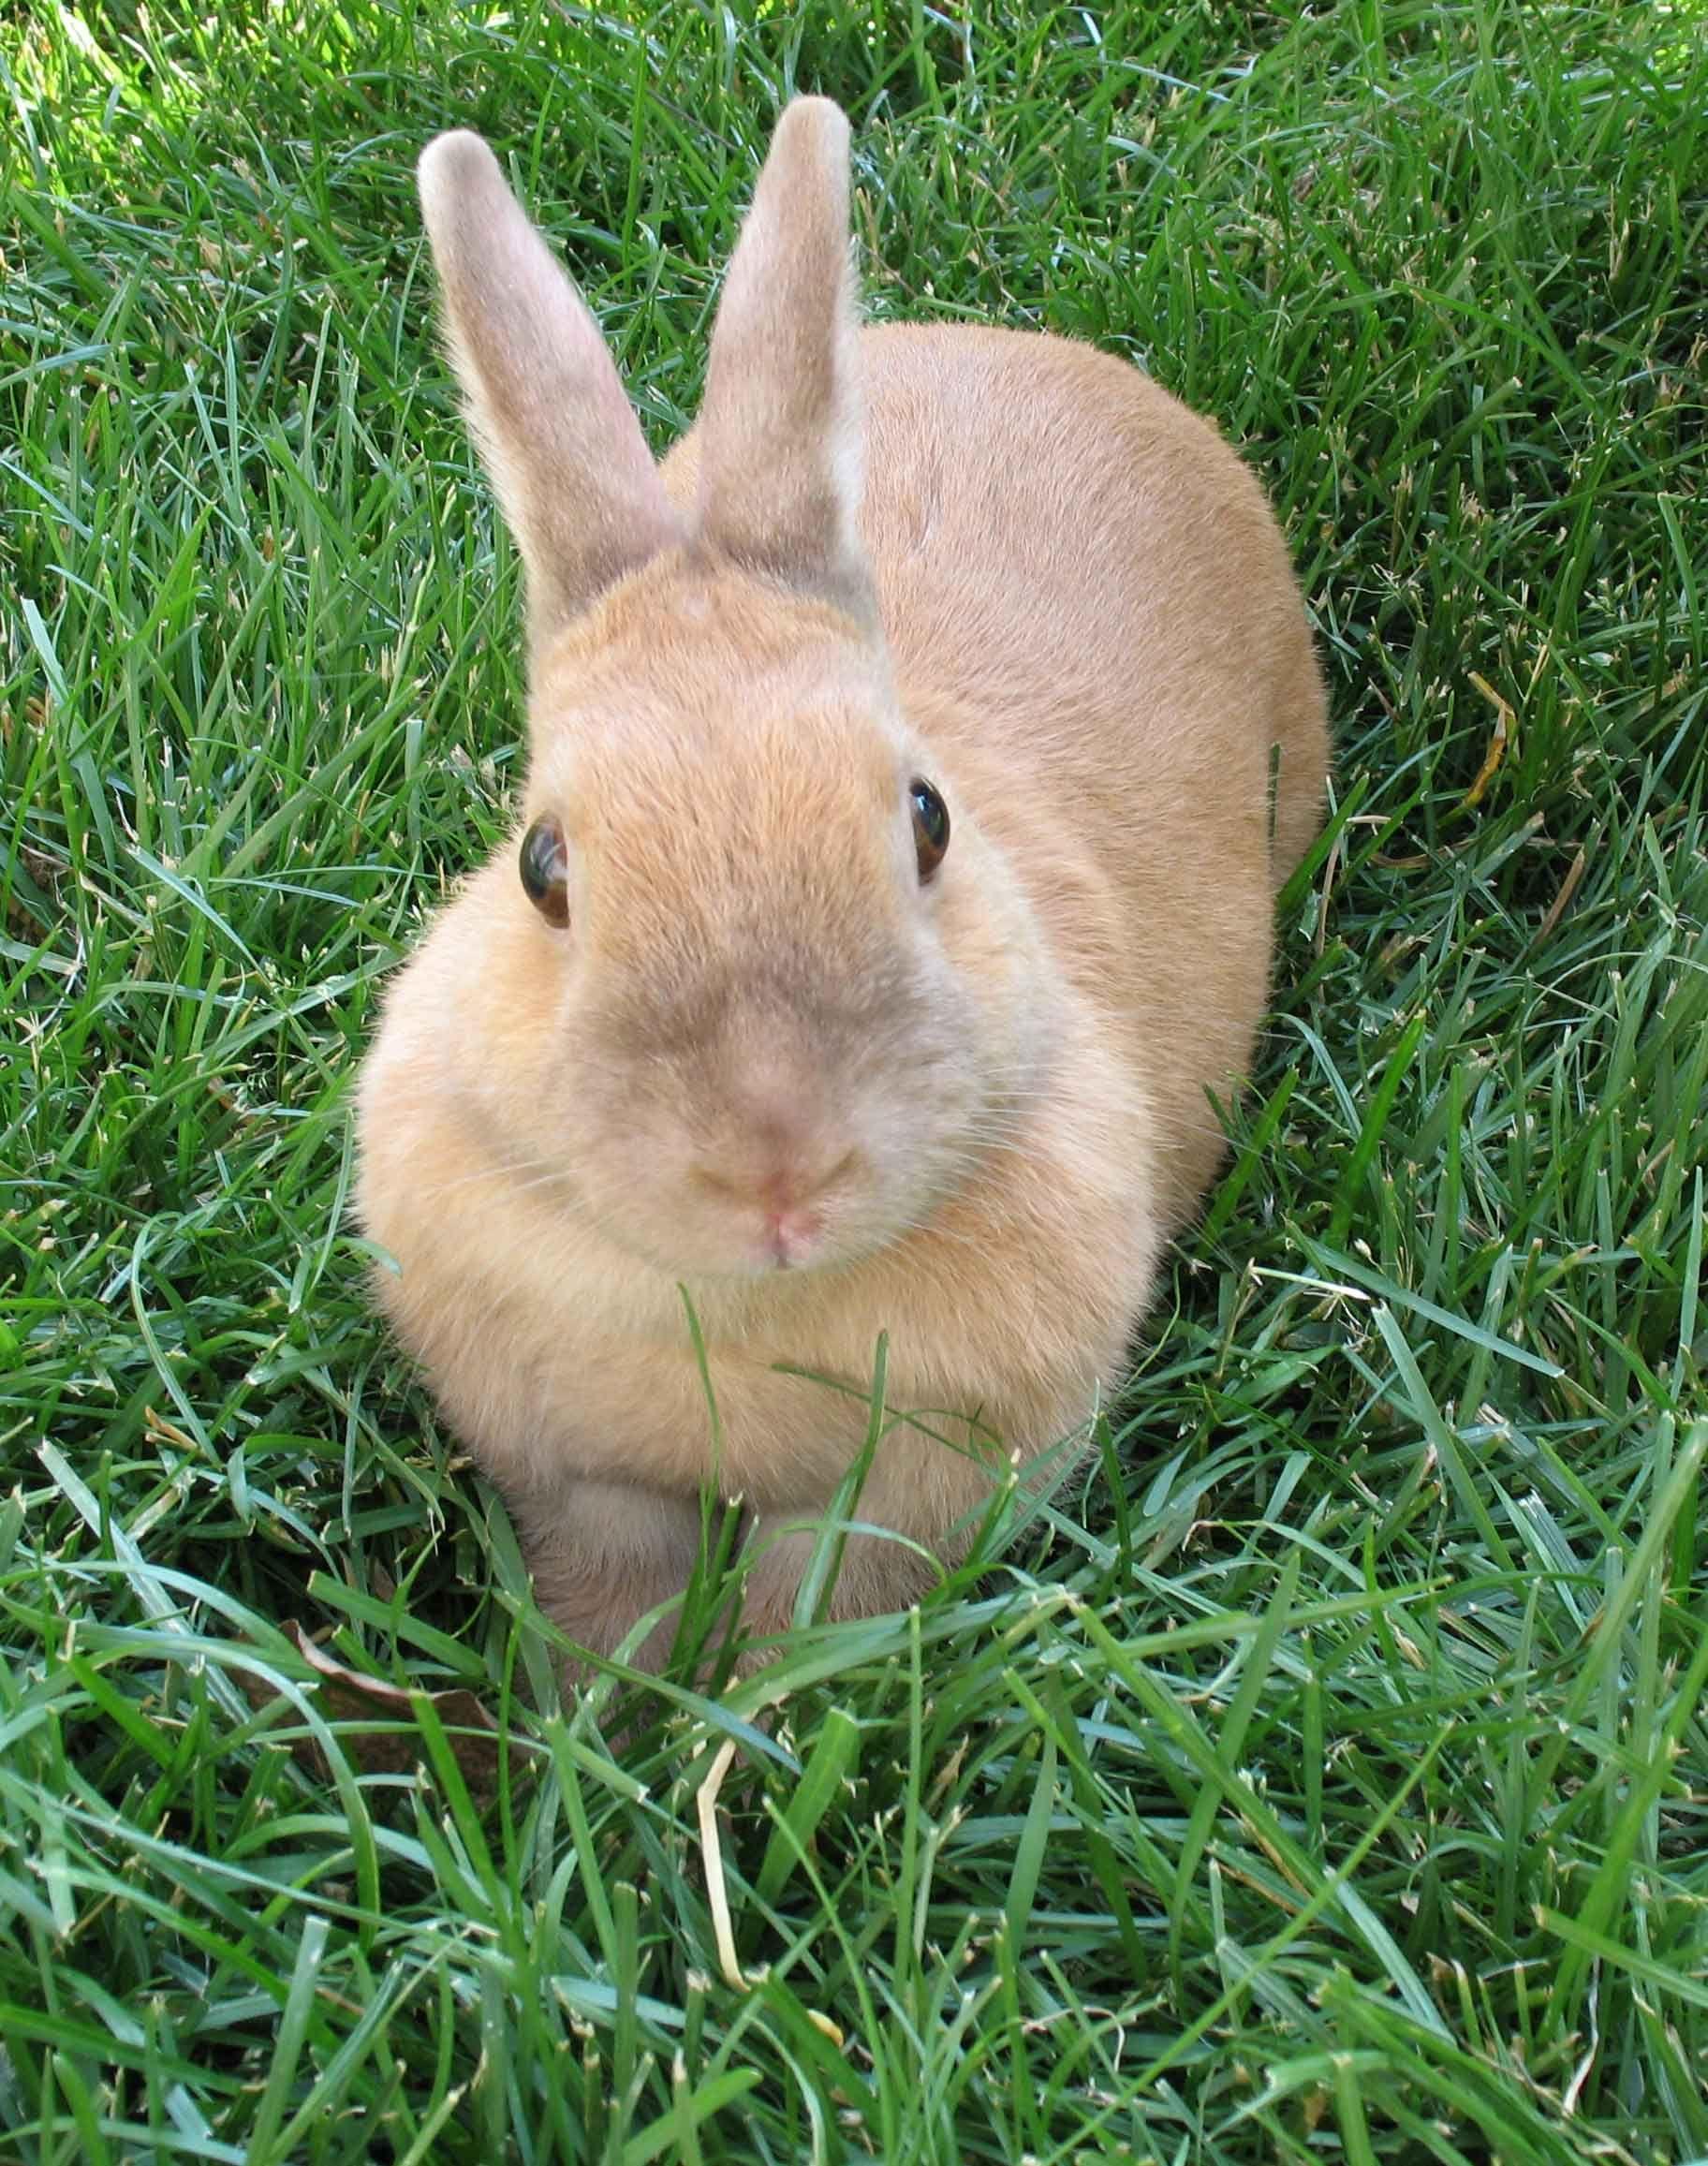 Lulu the 5-year old Netherland Dwarf rabbit.